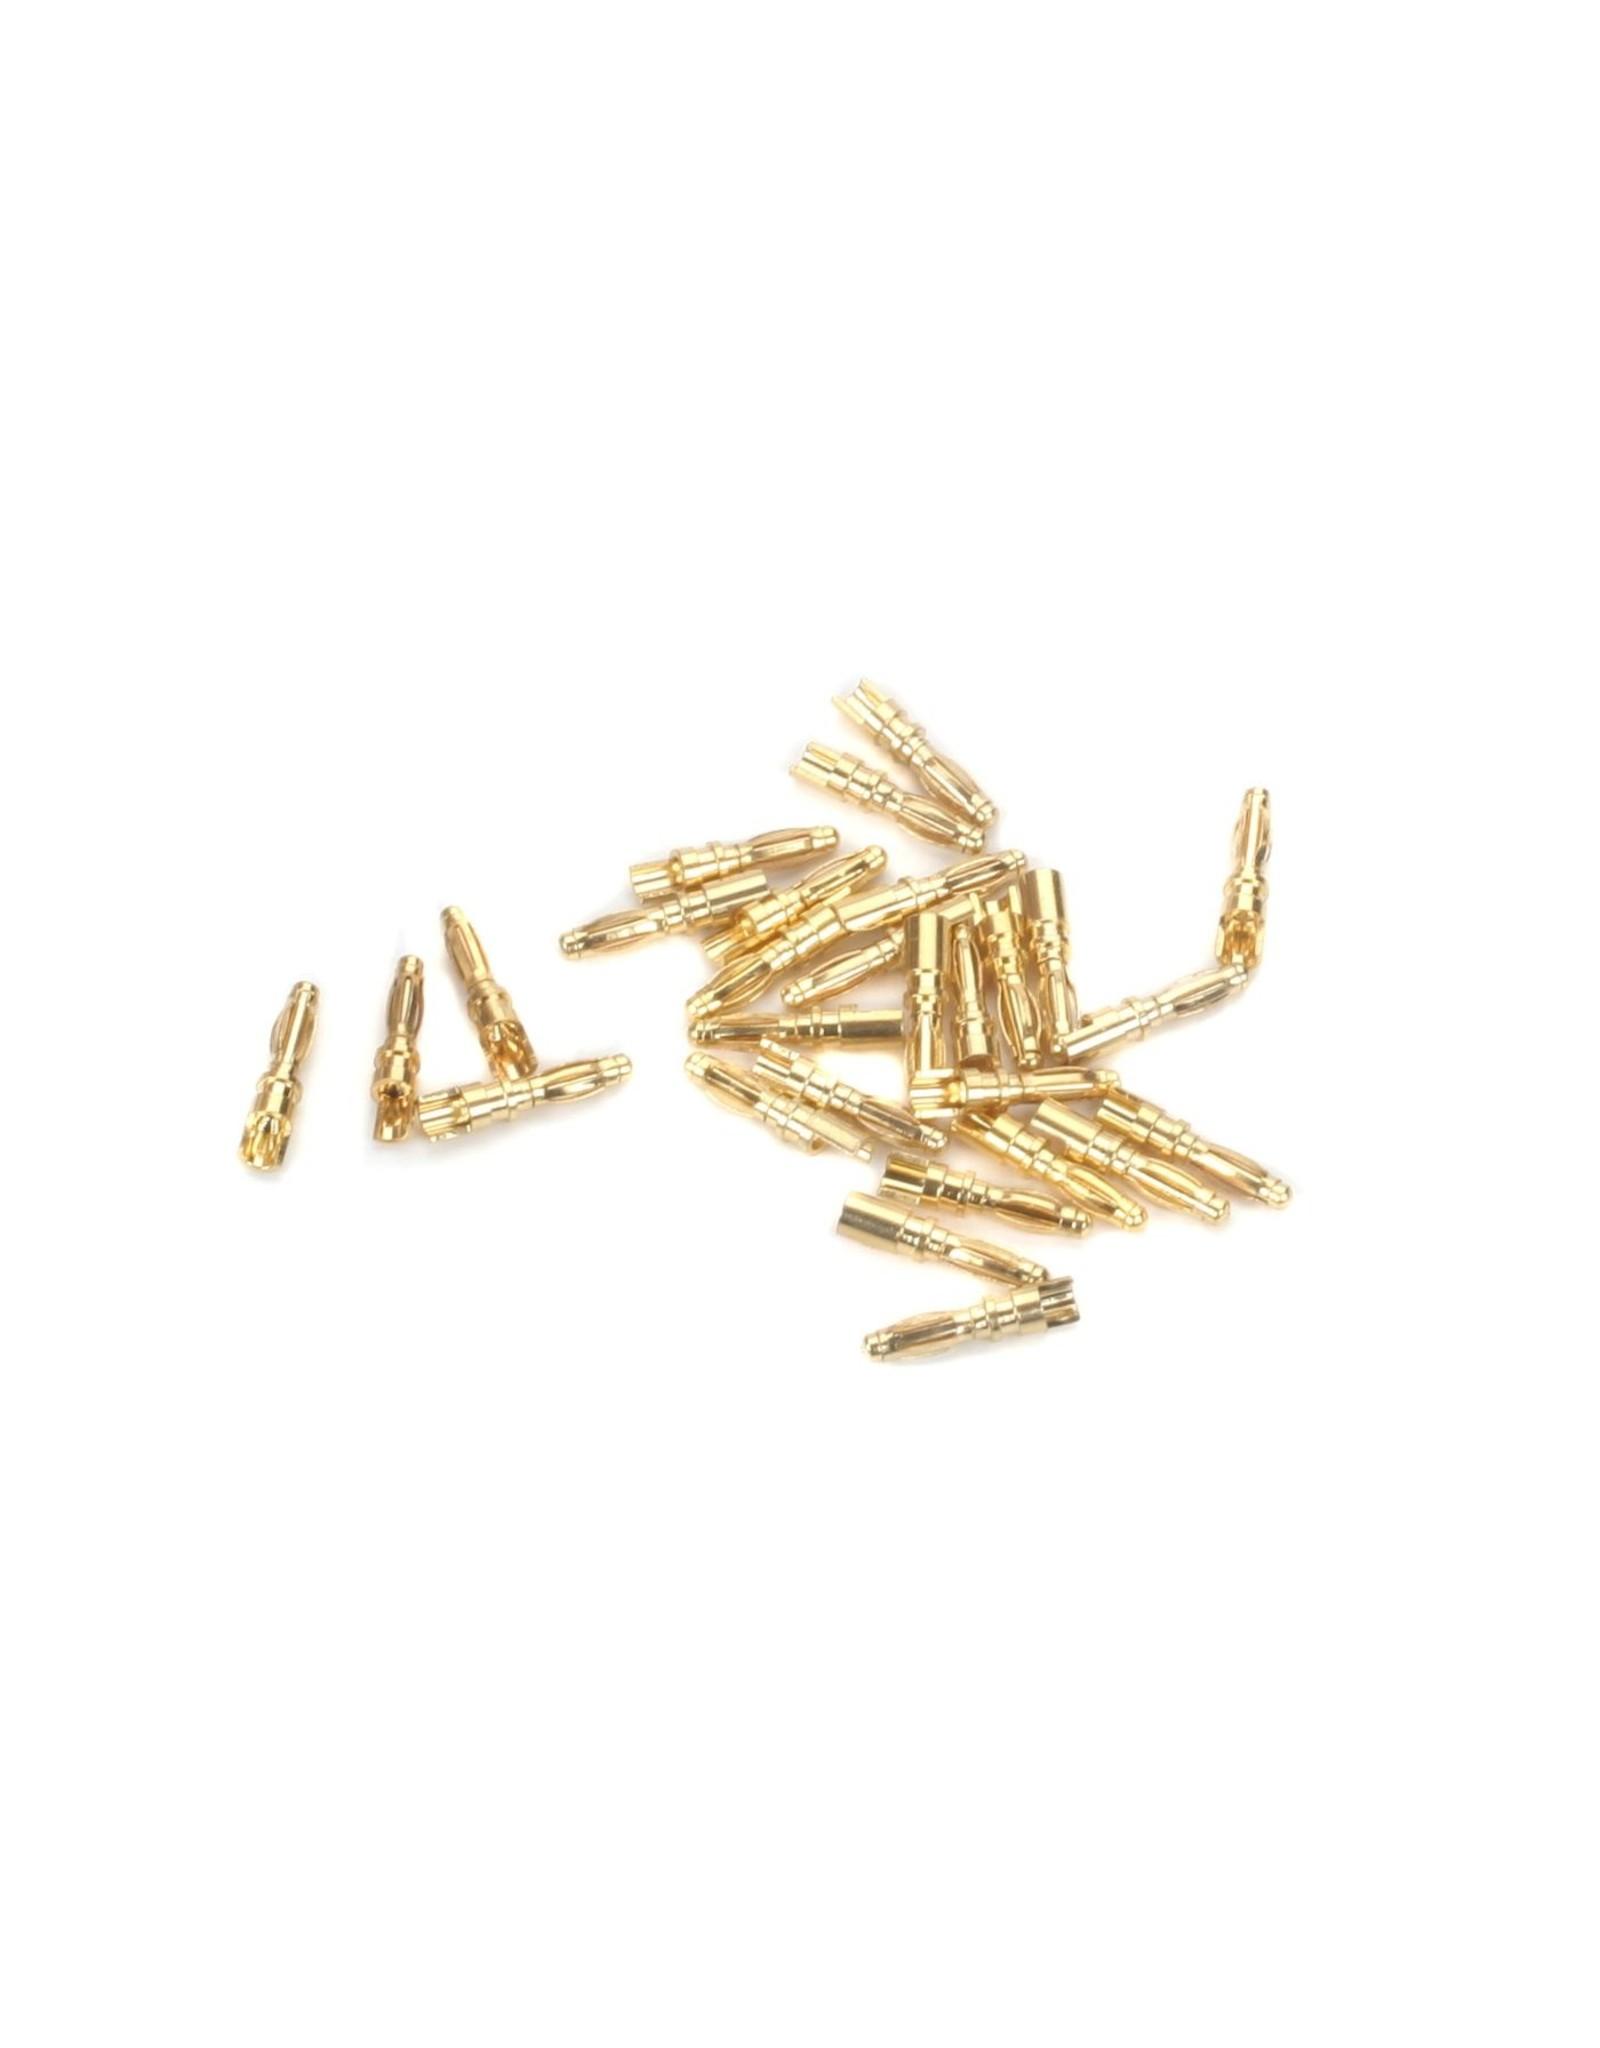 Eflite Gold Bullet Connector, Male, 2mm (30)